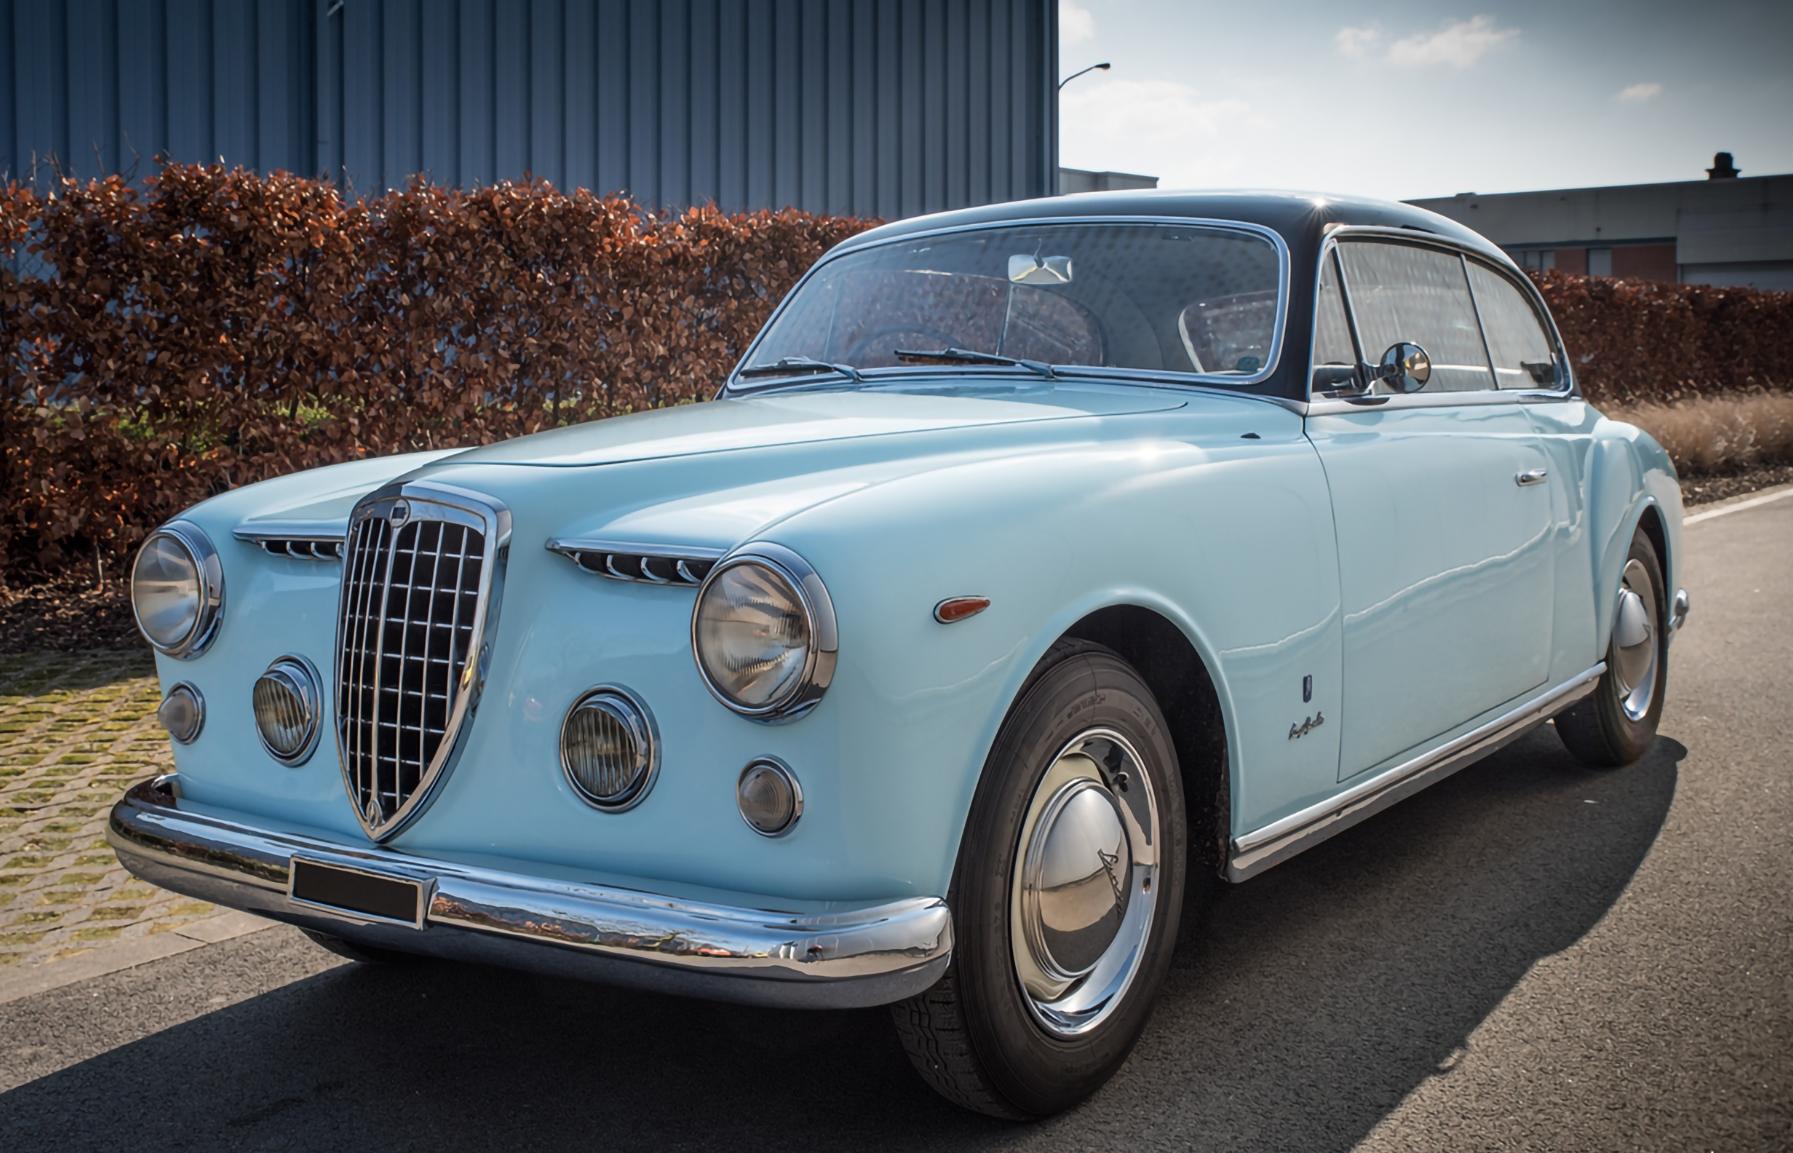 Lancia Aurelia B53 Allemano Ruote Leggendarie